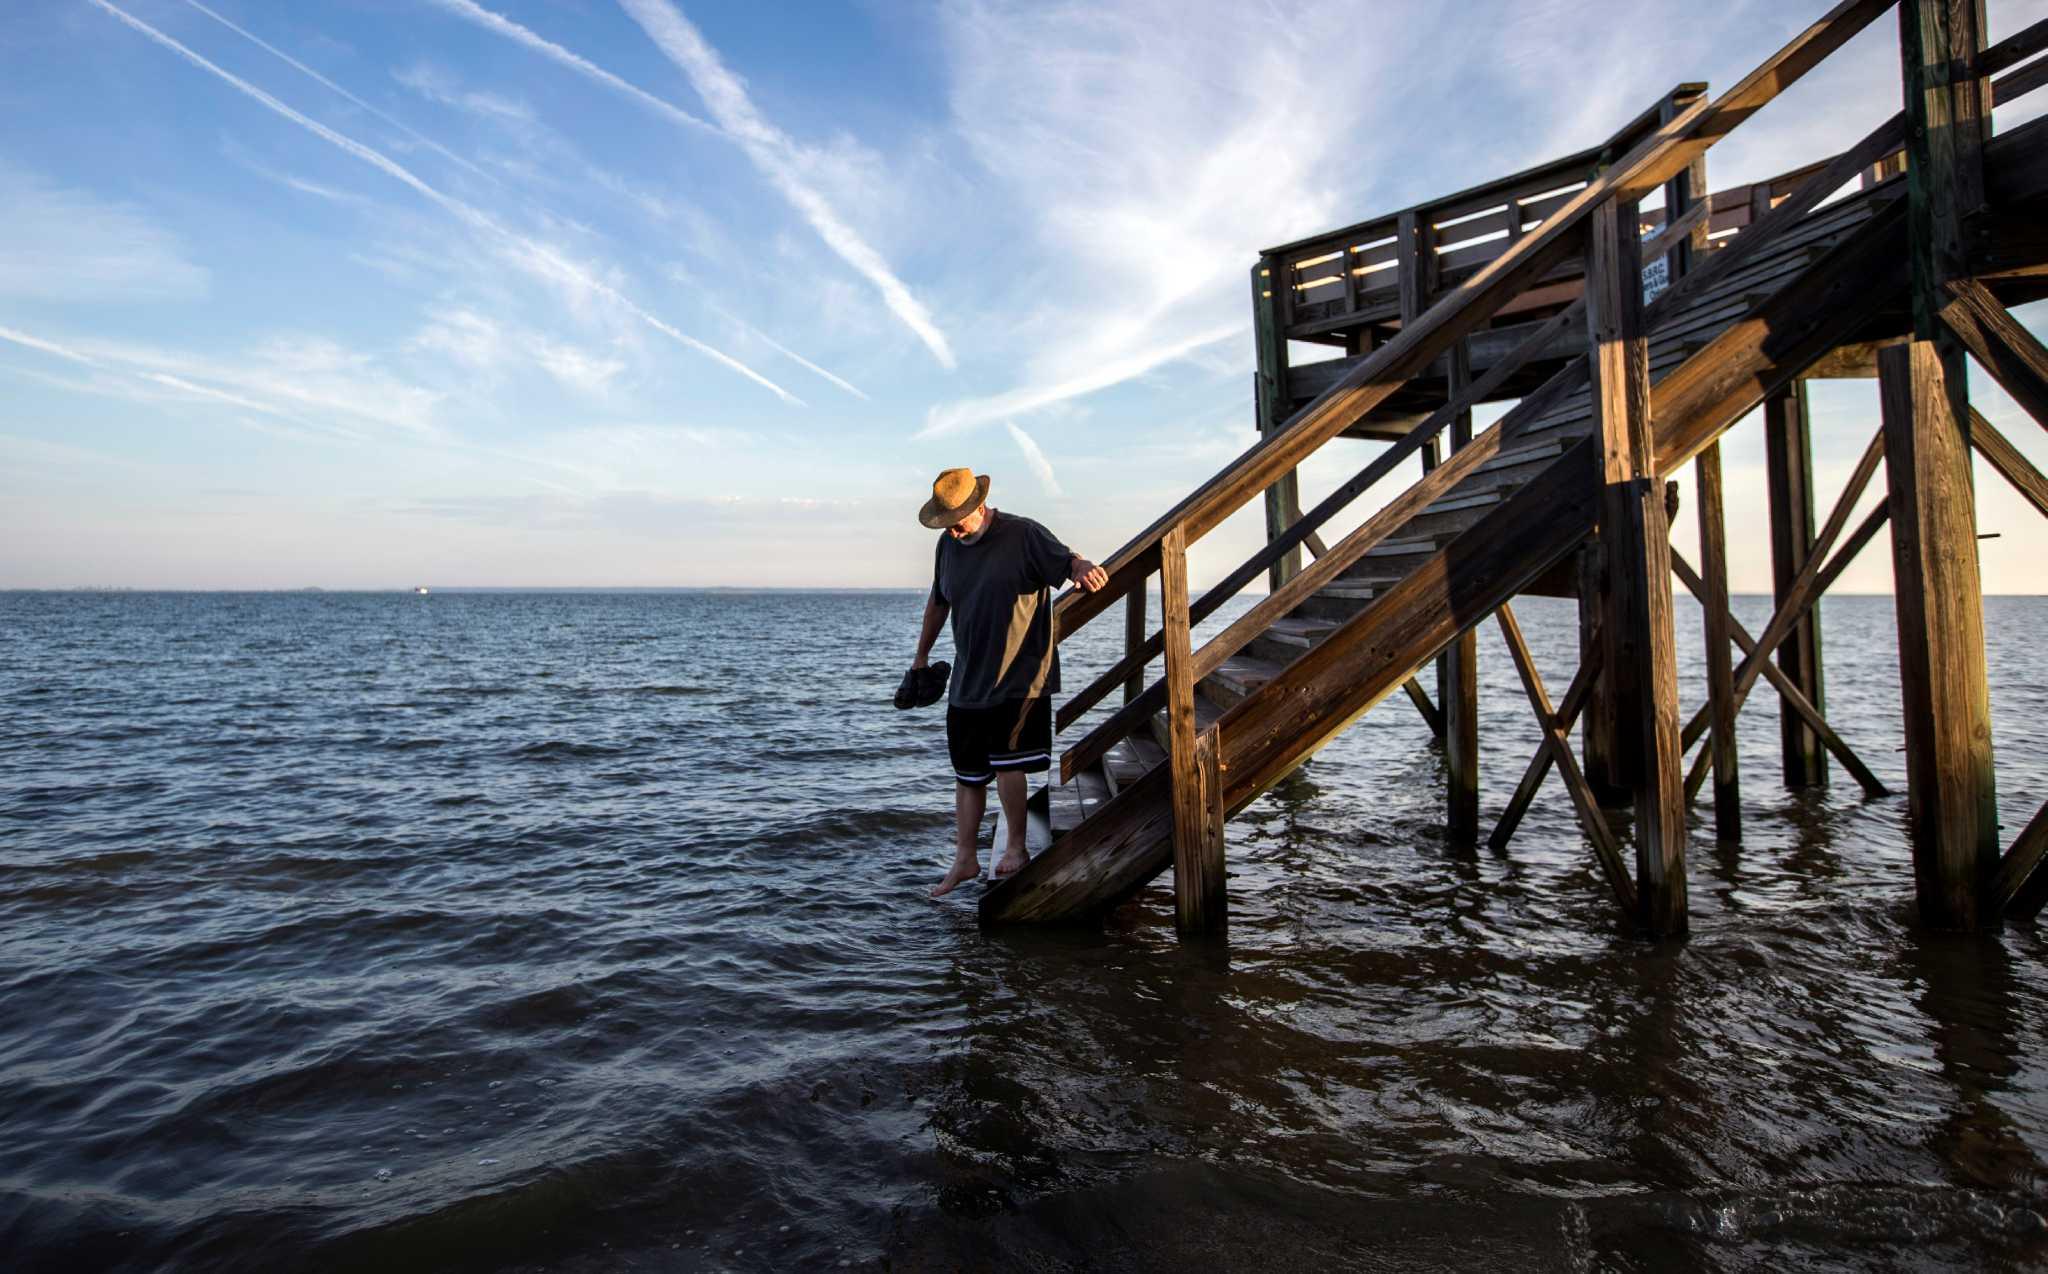 Sea levels are rising americas coasts feel it already houston sea levels are rising americas coasts feel it already houston chronicle nvjuhfo Choice Image